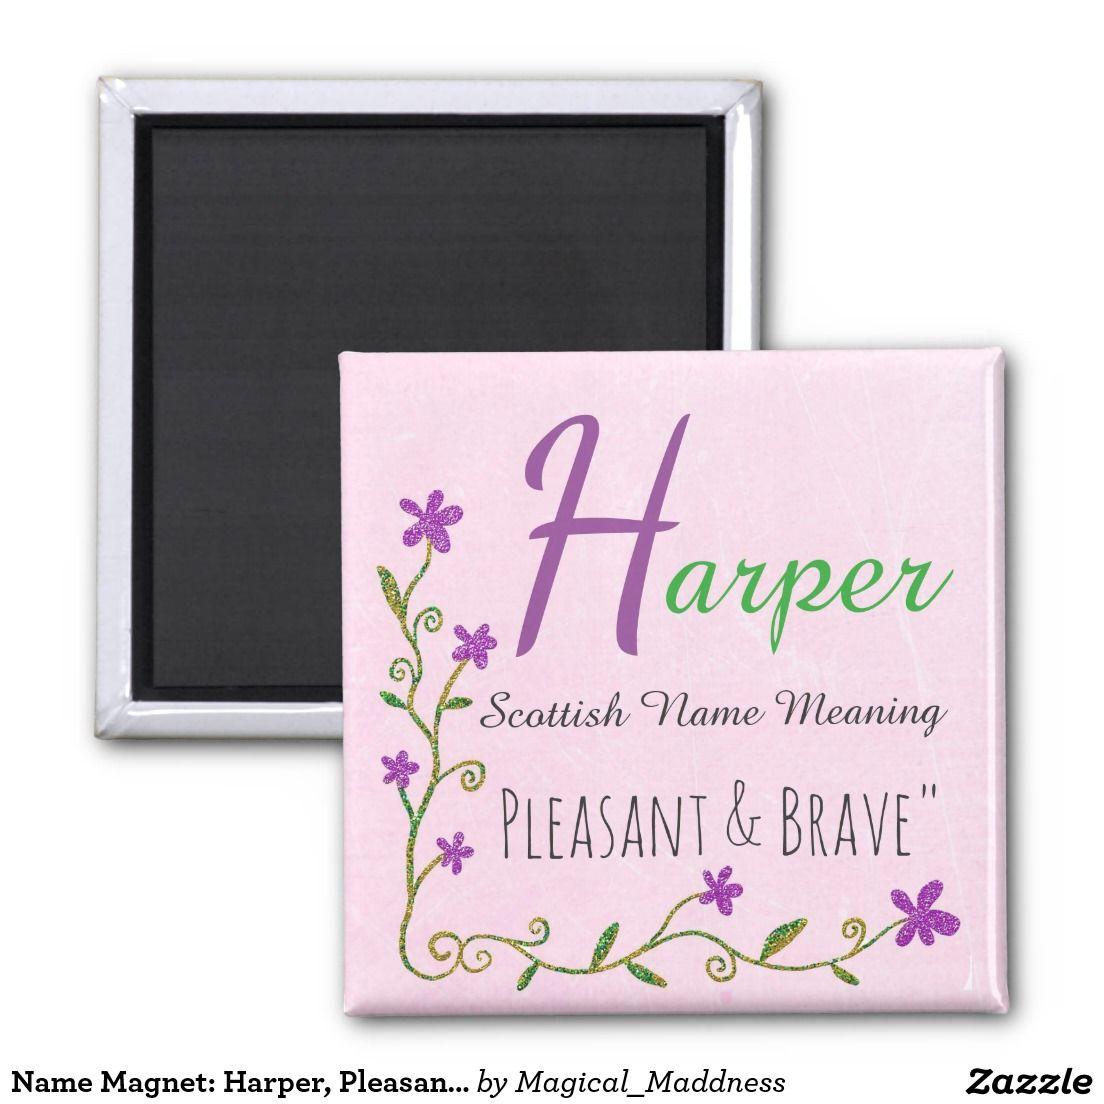 Name Magnet: Harper, Pleasant & Brave